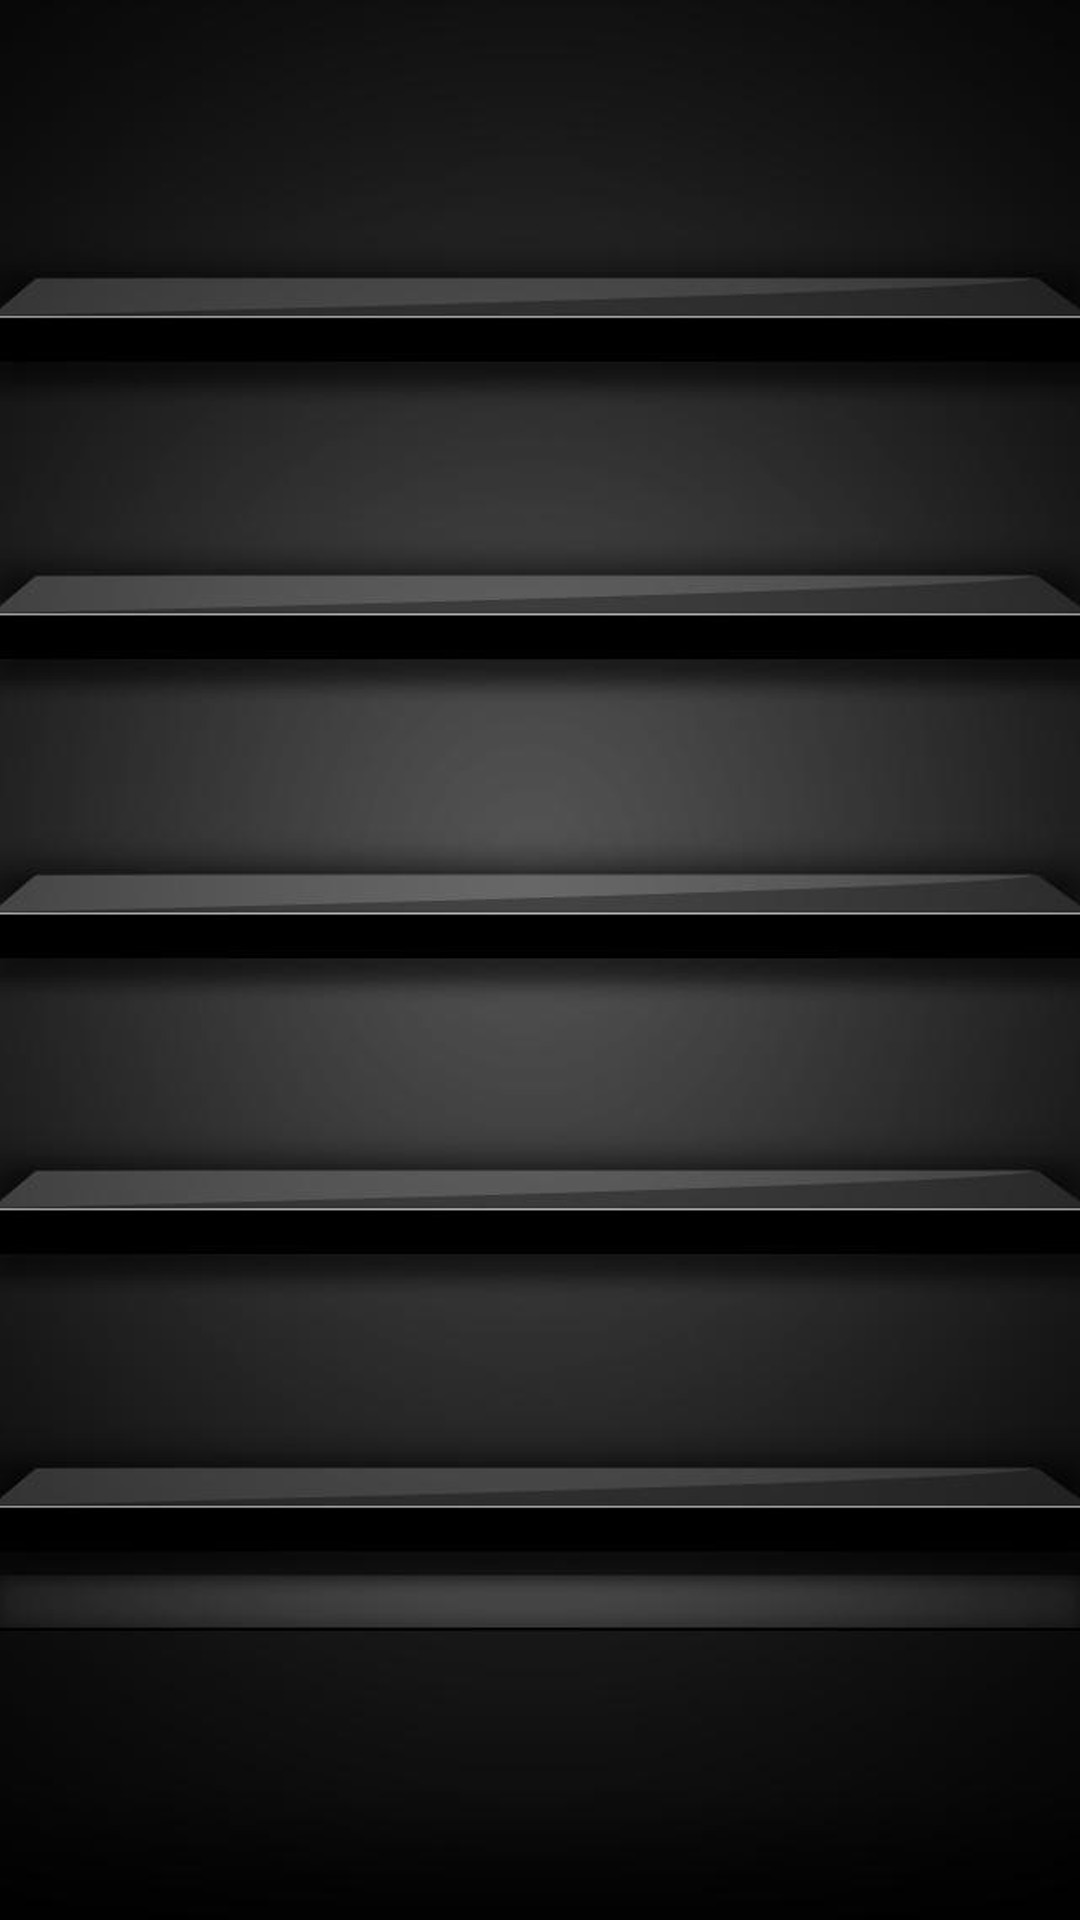 Shelf iPhone 6 Plus Wallpaper 67 iPhone 6 Plus Wallpapers HD 1080x1920